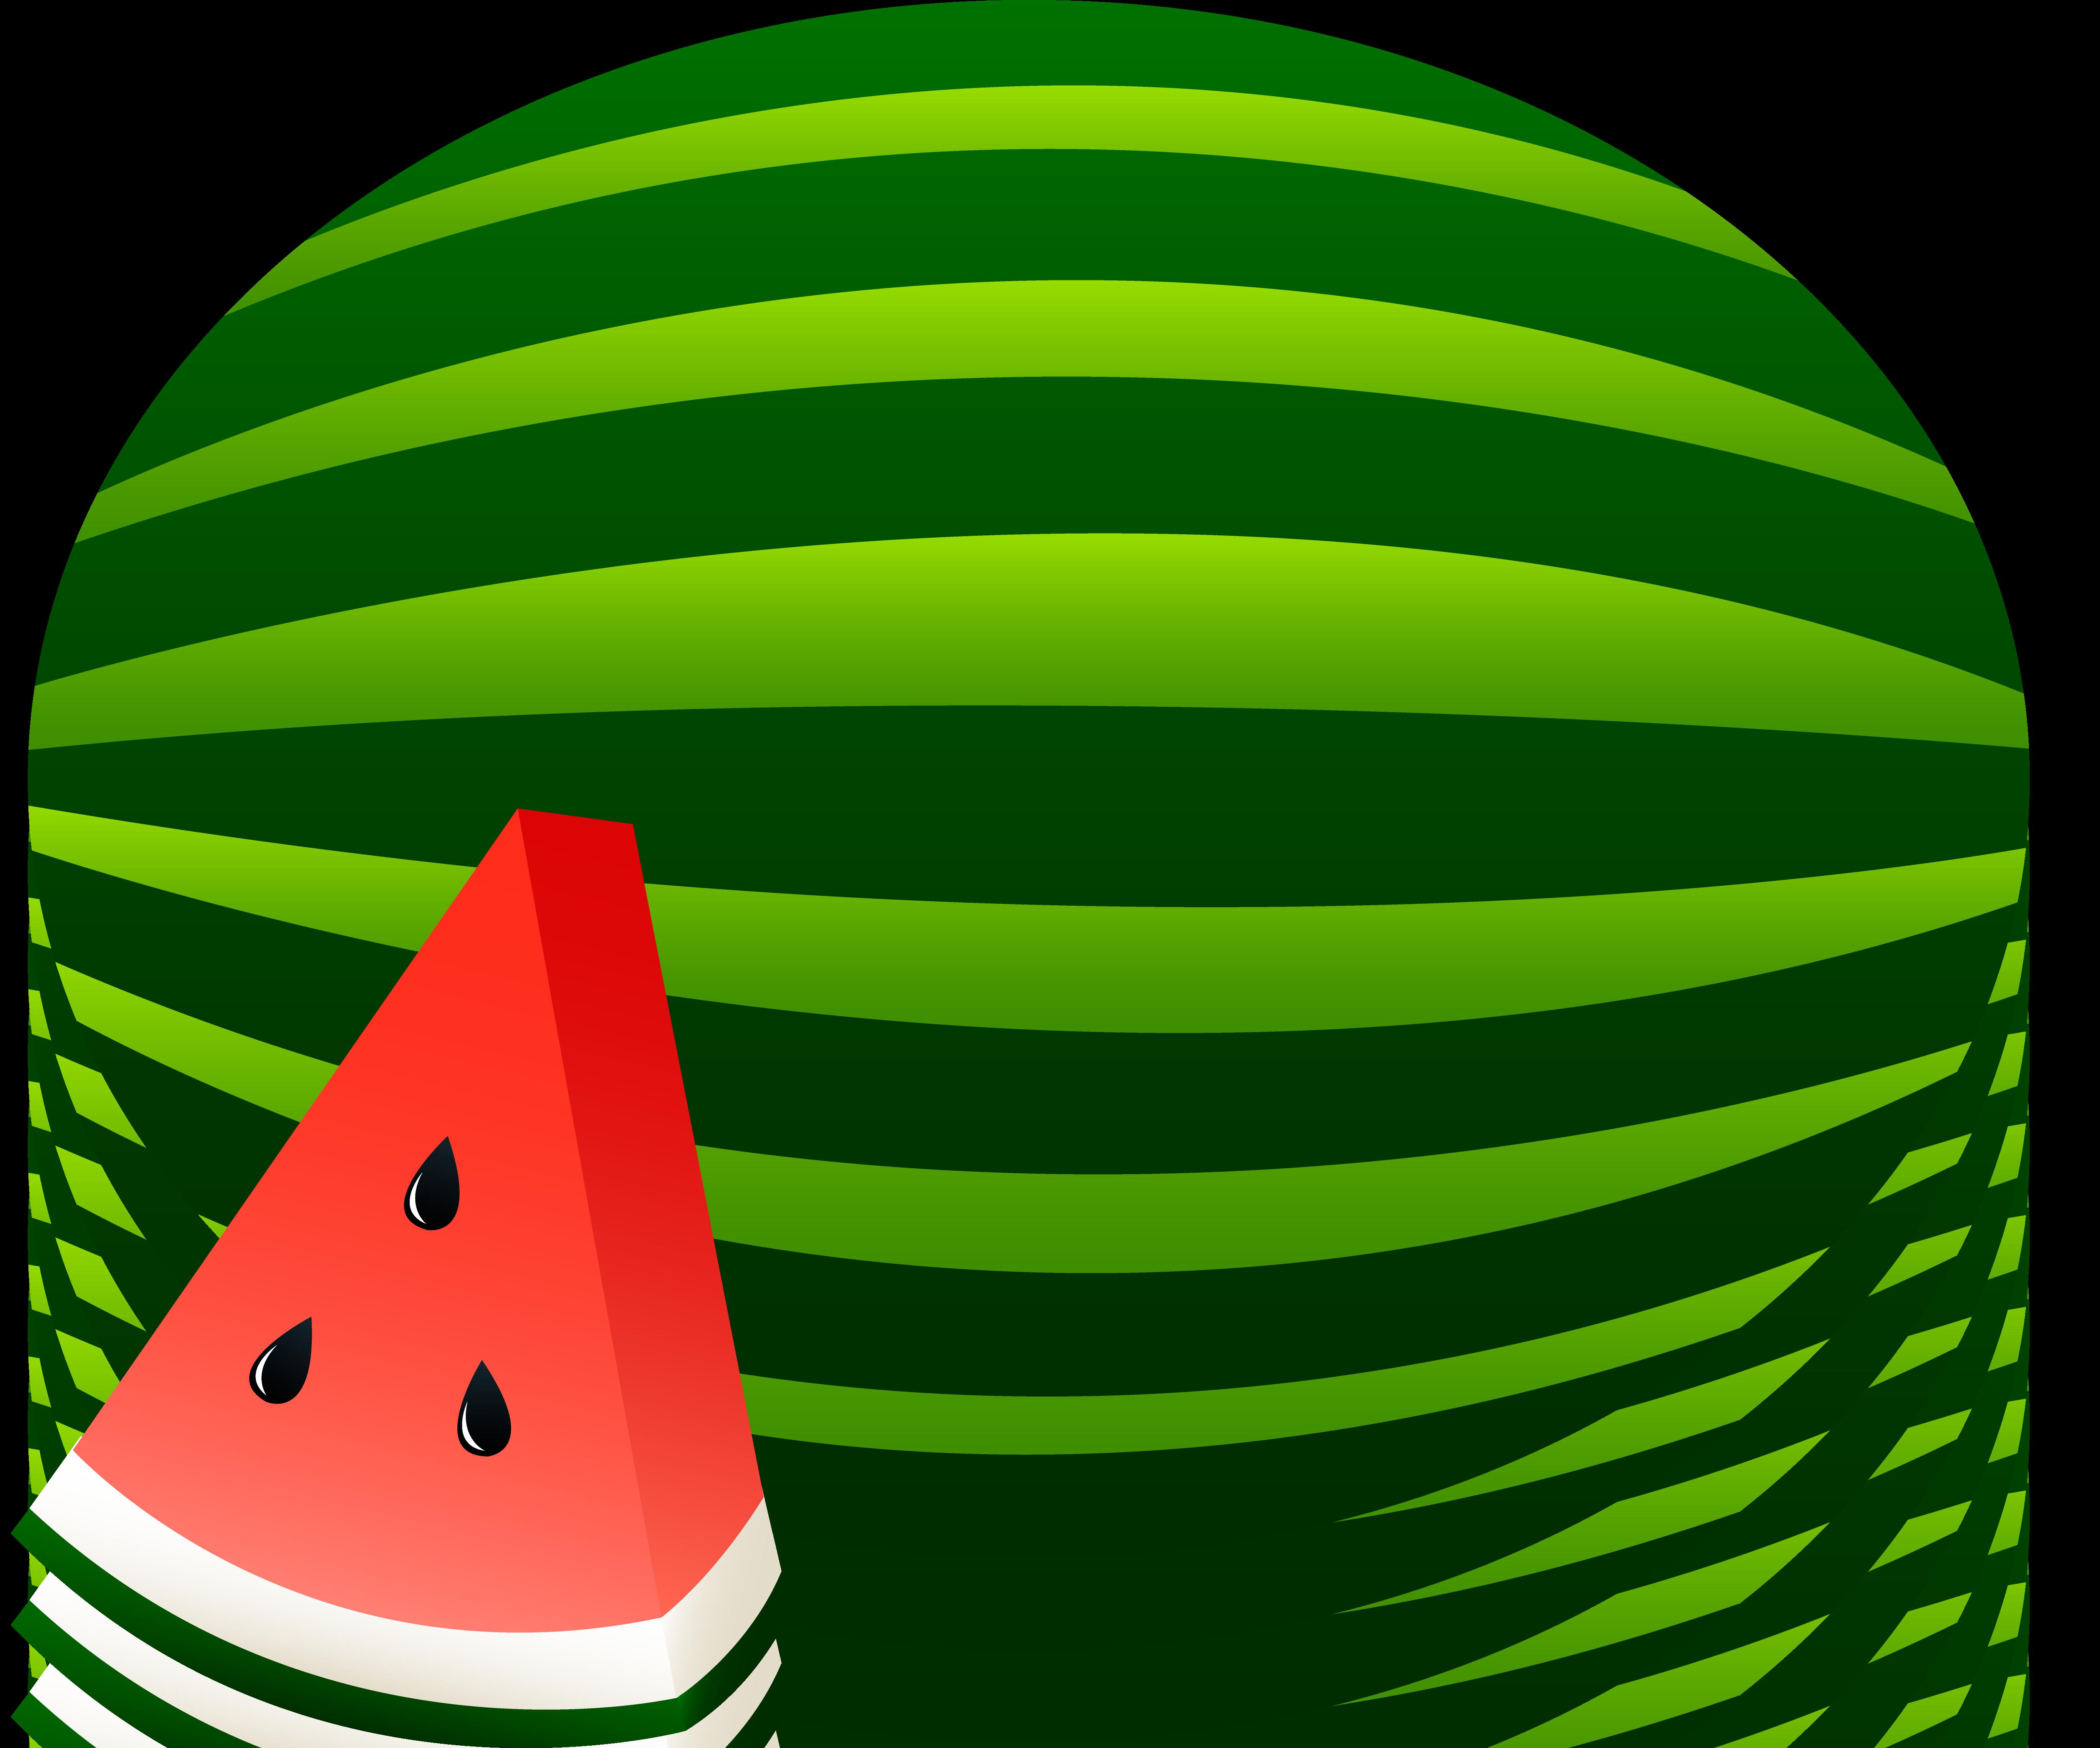 Watermelon Clipart Black And White   Clipart Panda - Free ...